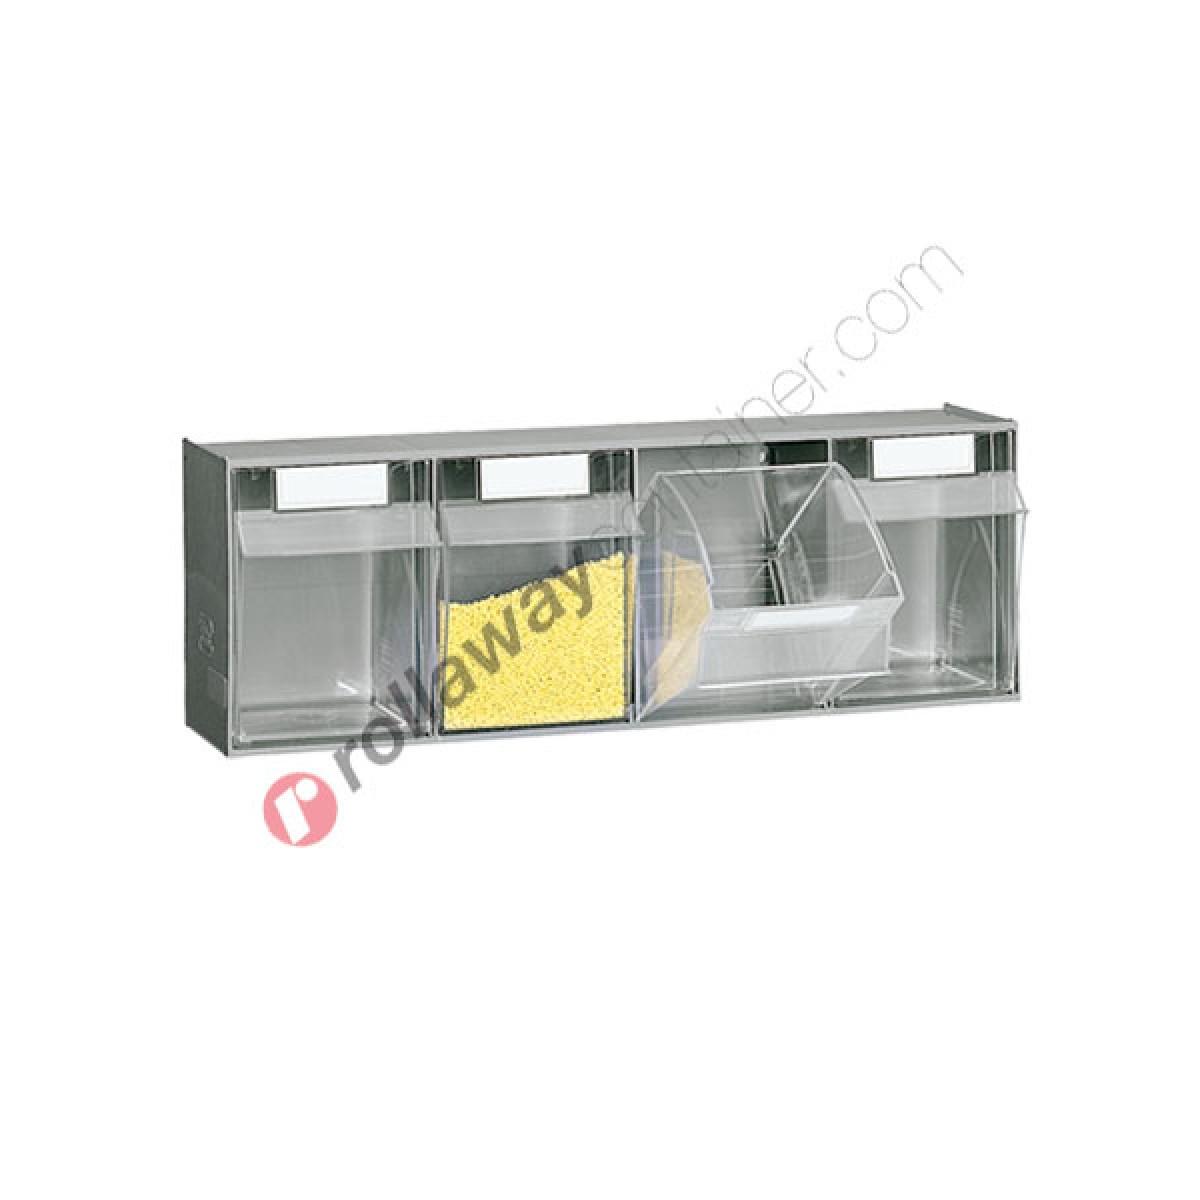 rangement visserie atelier 600 x 174 h 206 mm avec 4 tiroirs. Black Bedroom Furniture Sets. Home Design Ideas